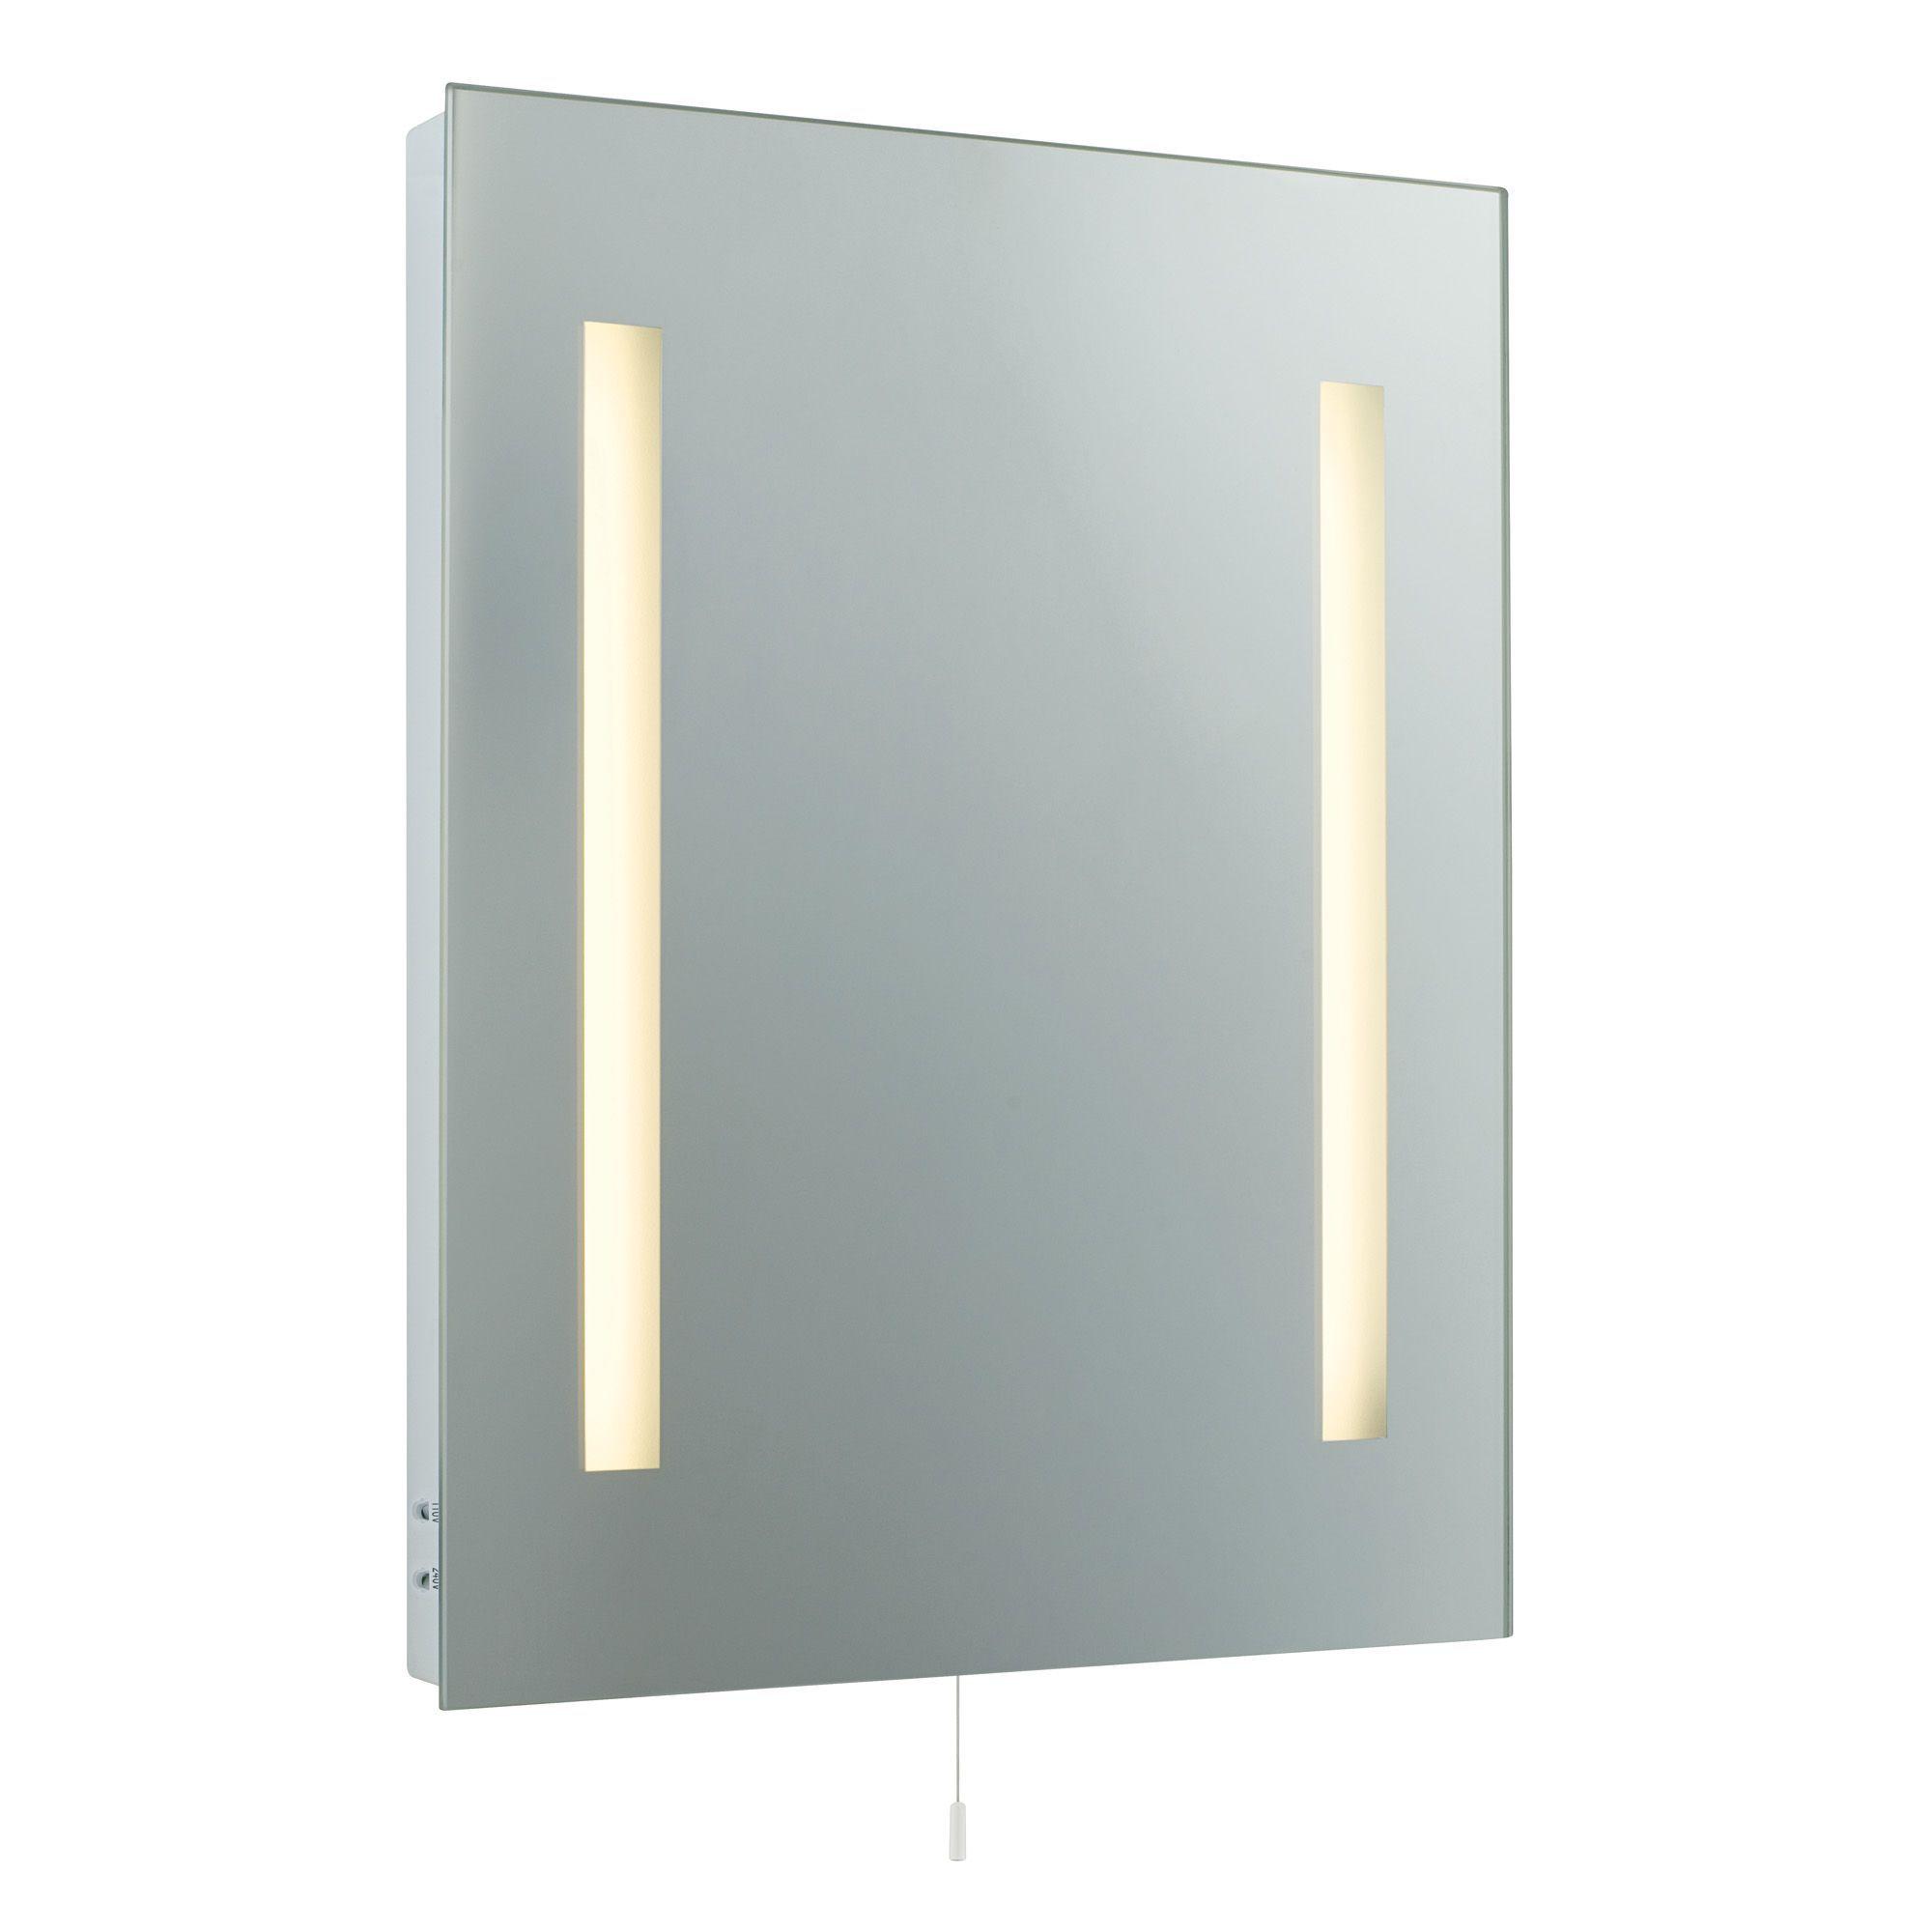 Cooke & Lewis Danube Illuminated Bathroom Rectangular Mirror (w)390mm (h)500mm